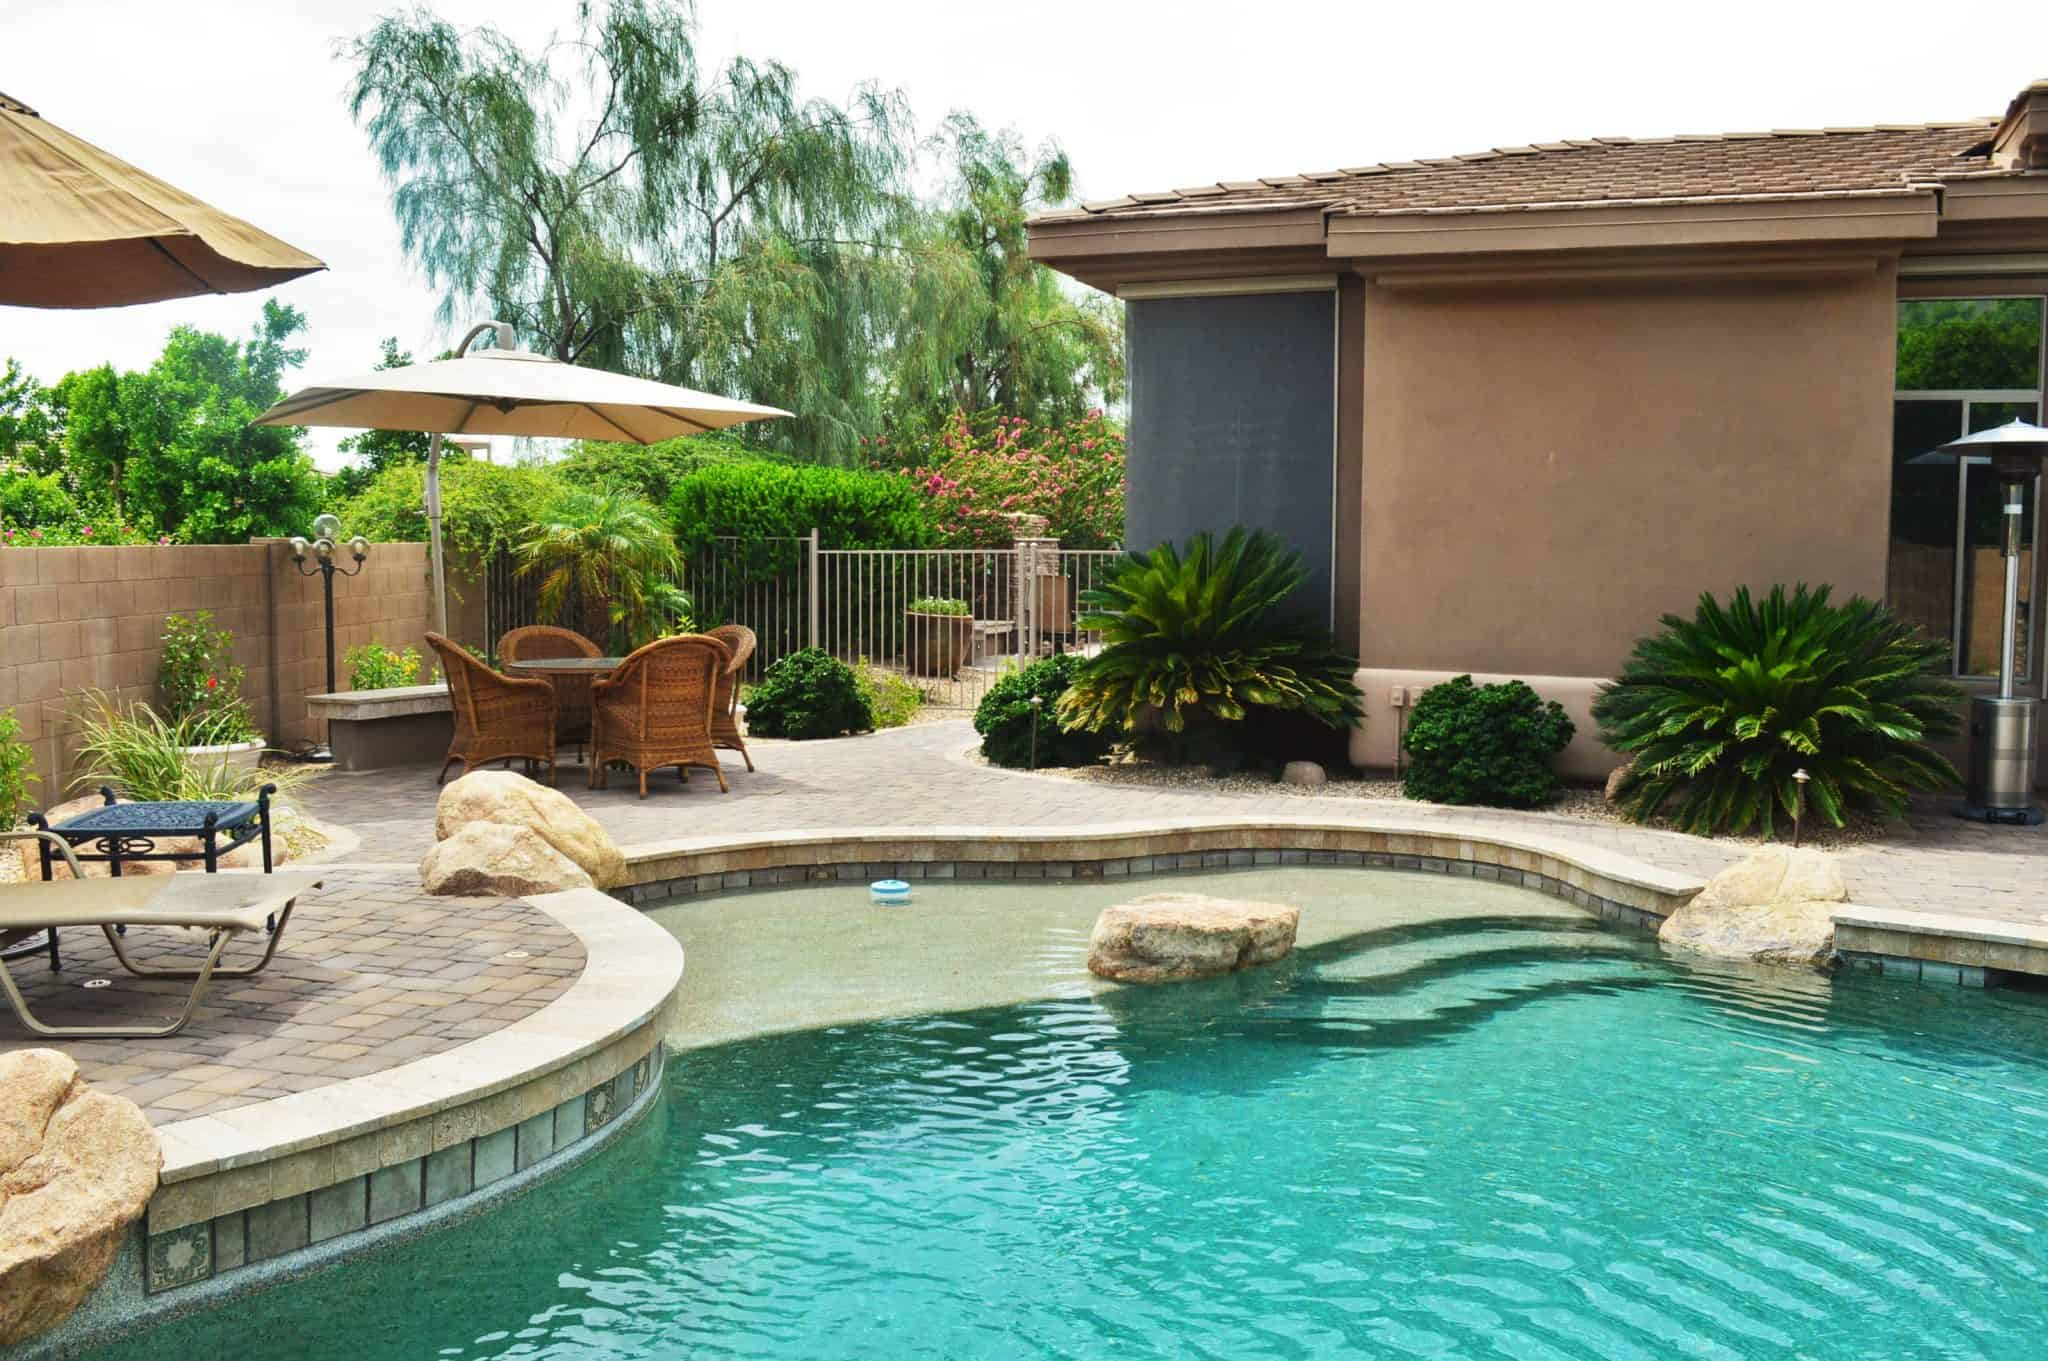 imagine backyard living tub spa jacuzzi sundance 1